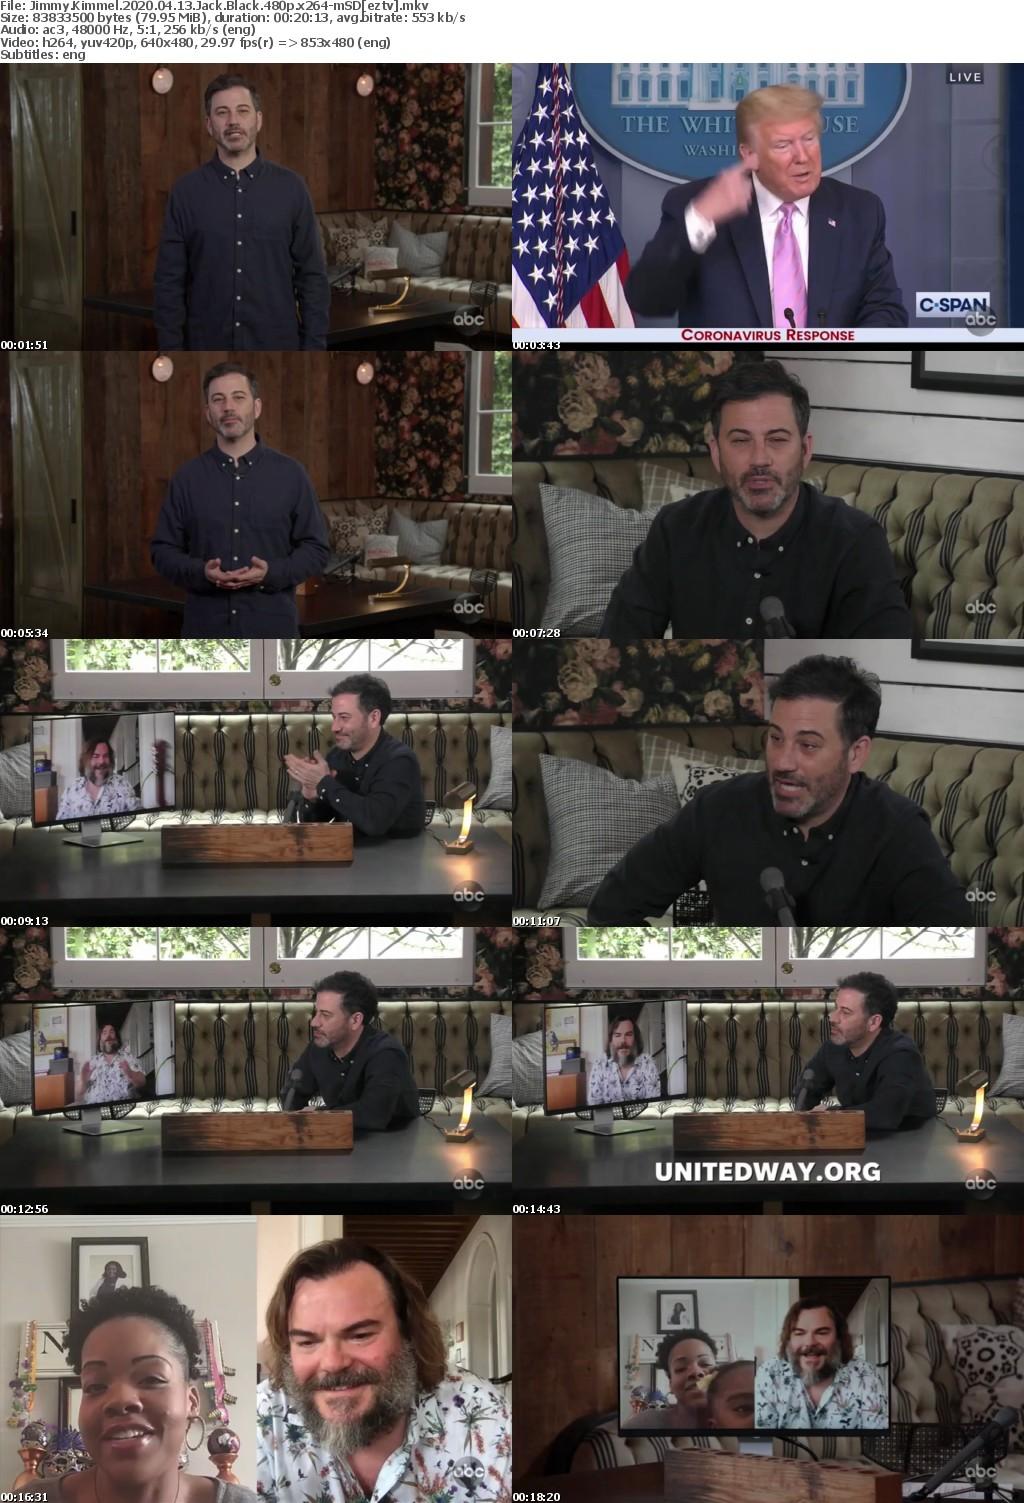 Jimmy Kimmel 2020 04 13 Jack Black 480p x264-mSD